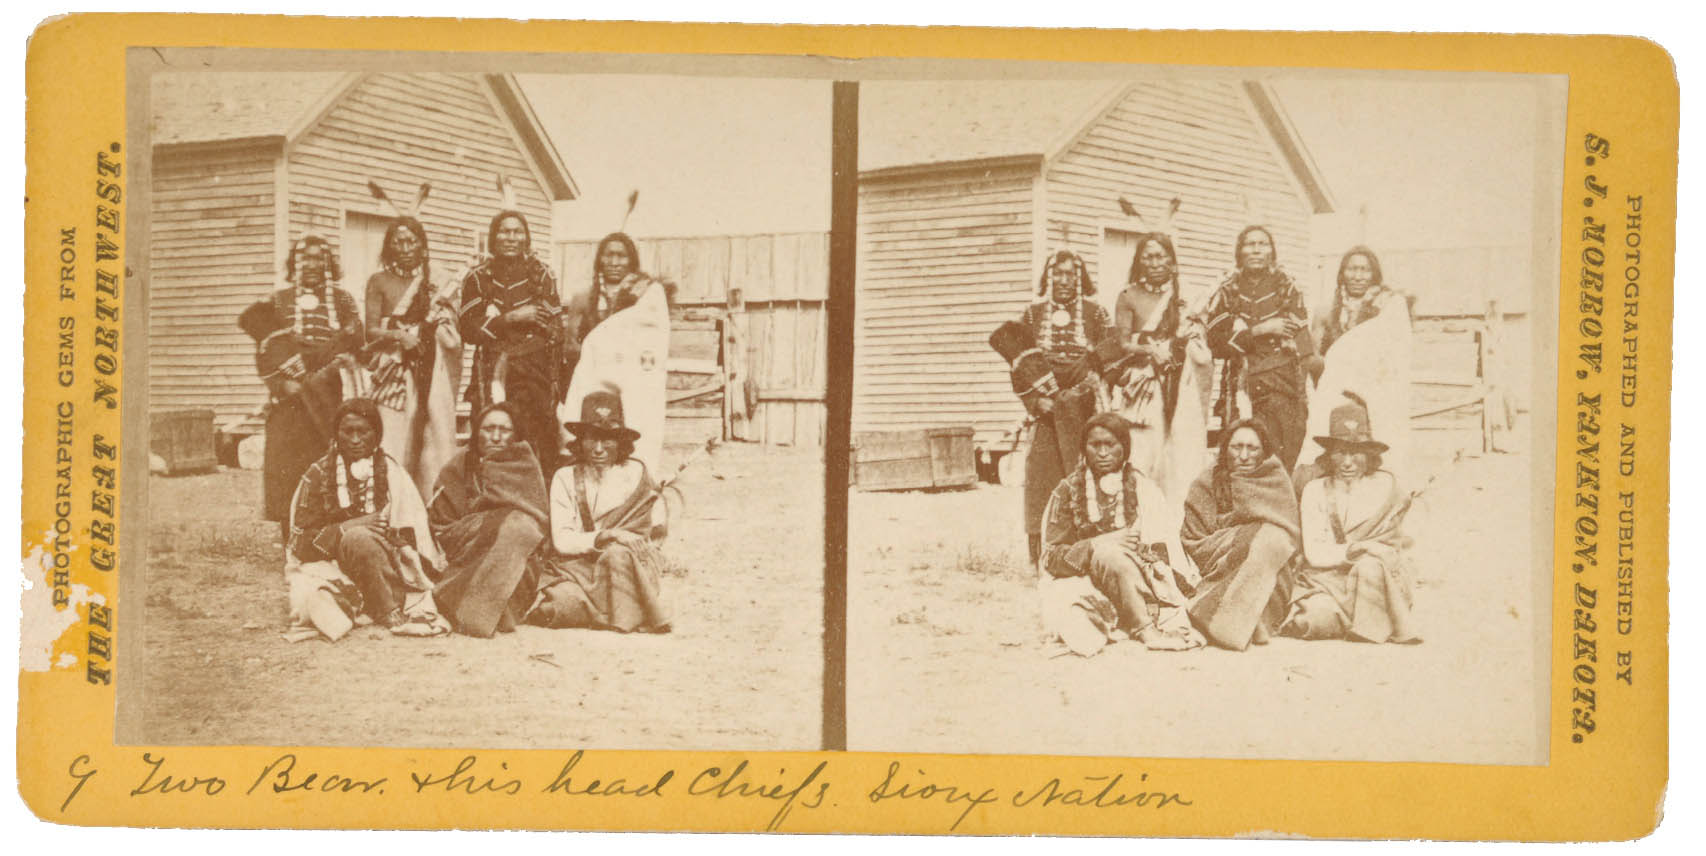 http://www.american-tribes.com/messageboards/dietmar/Morrow6.jpg